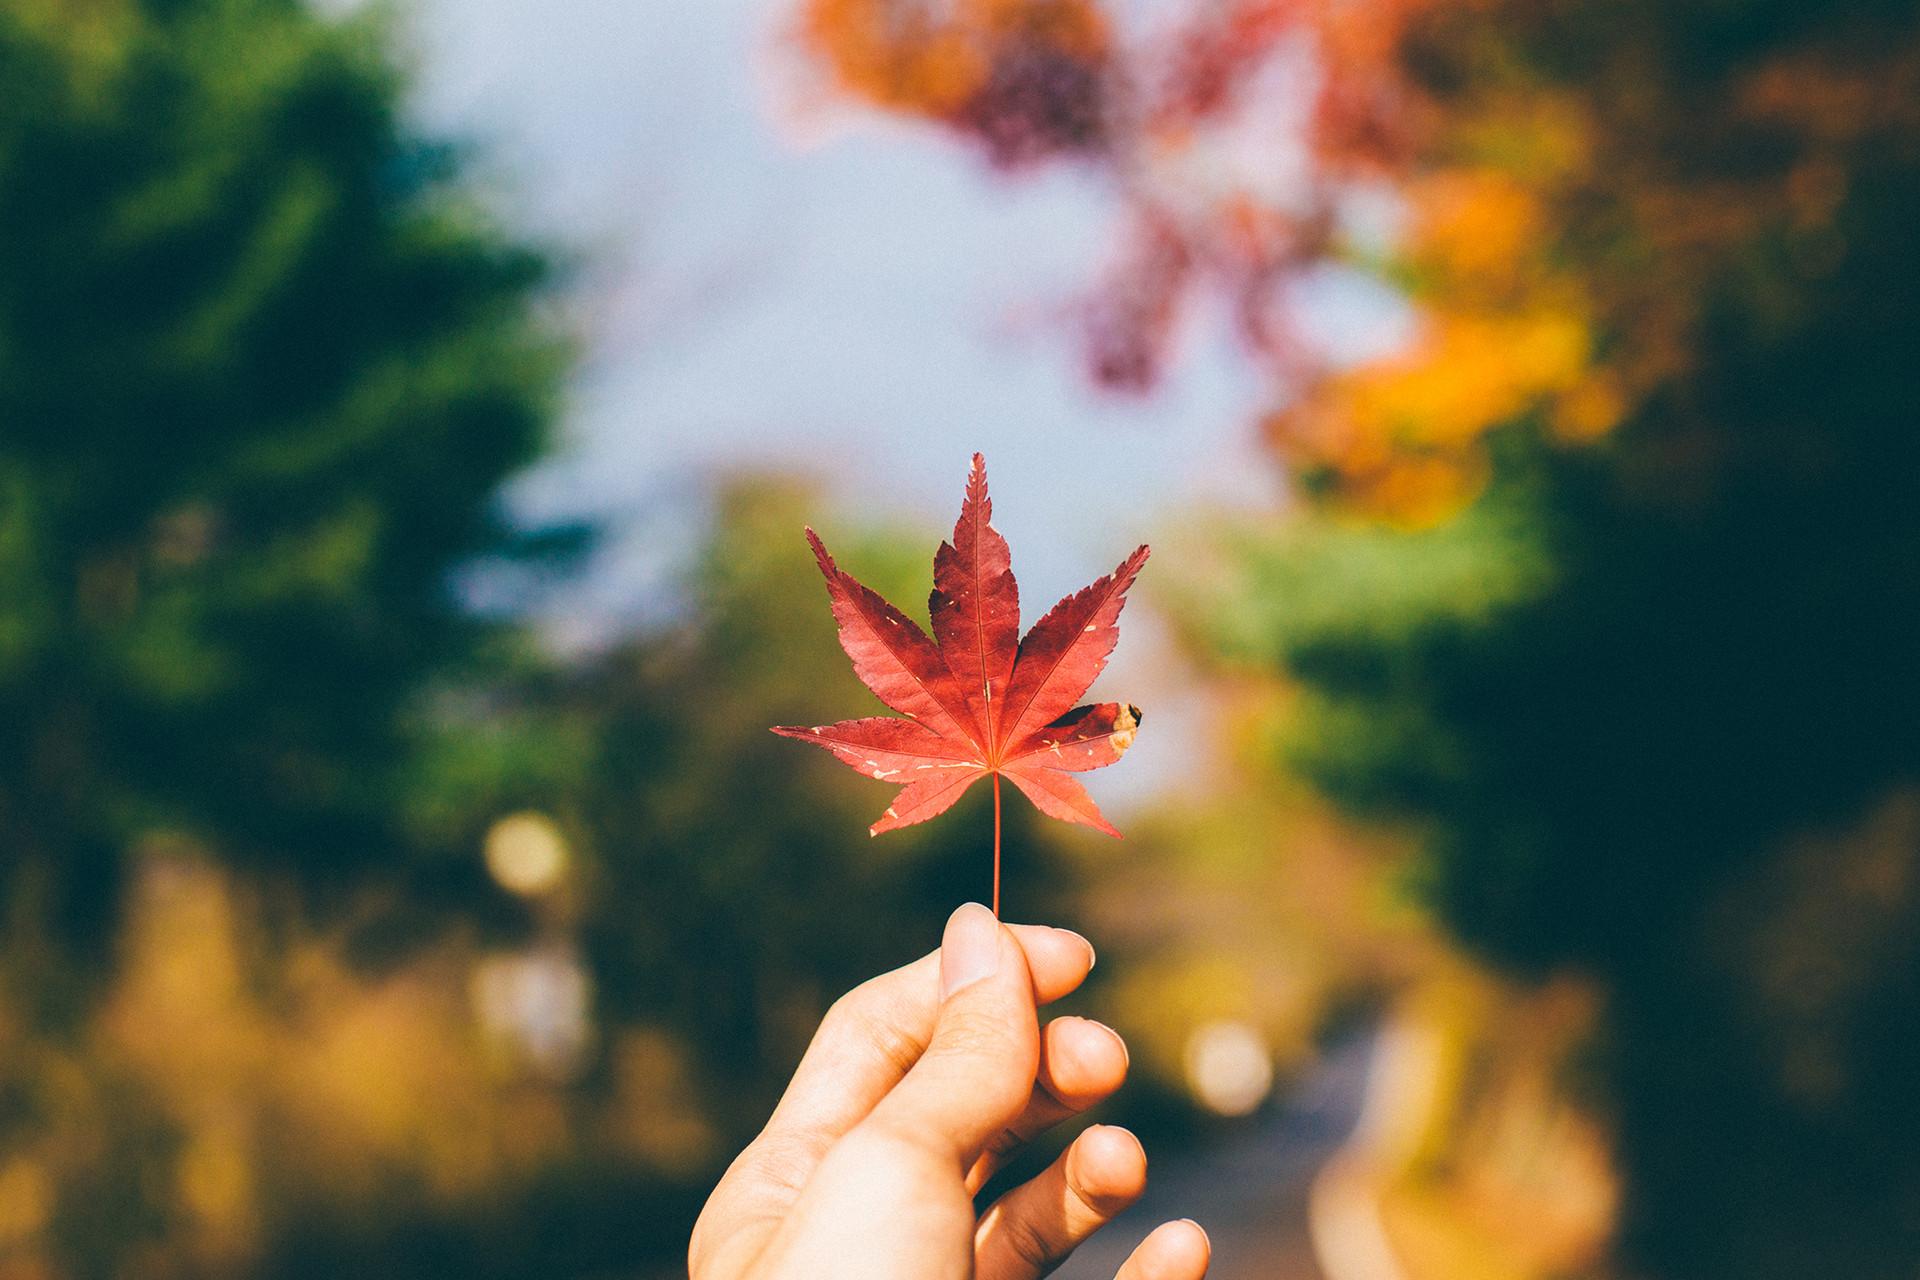 Gyeongju Autumn Leaf Fall Red Korea Travel Trip Malaysia Kuala Lumpur Melaka Johor Photography Top Best  Photographer 韓國 旅行 釜山 慶州 Jens Kv